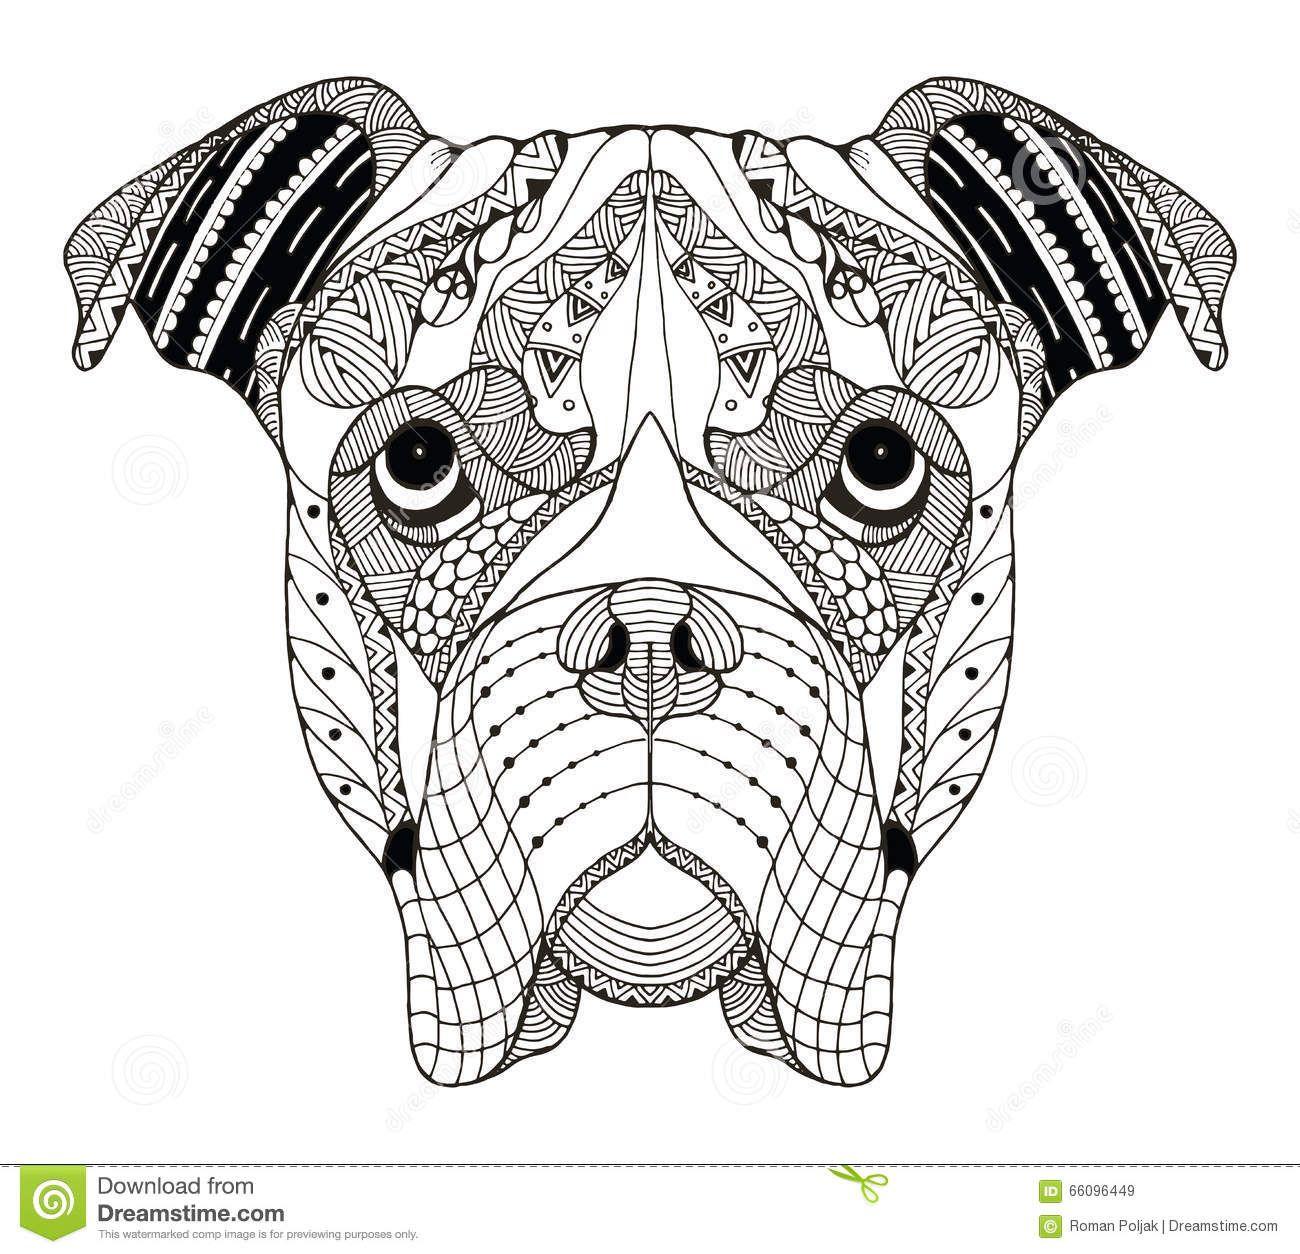 boxerdogheadzentanglestylizedvectorillustration